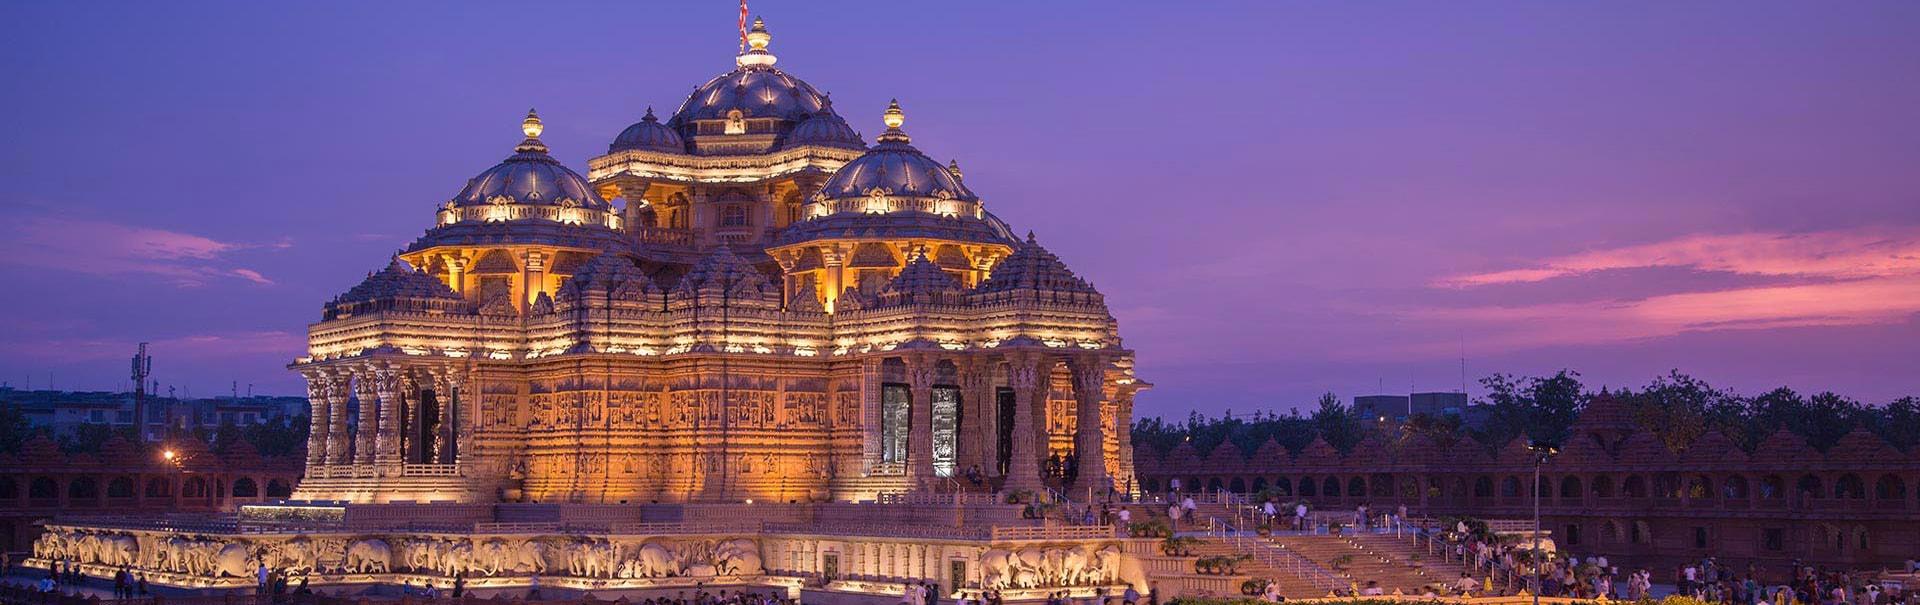 Delhi (2N) Post Tour Holiday - Akshardham Temple (PHNI2) Banner